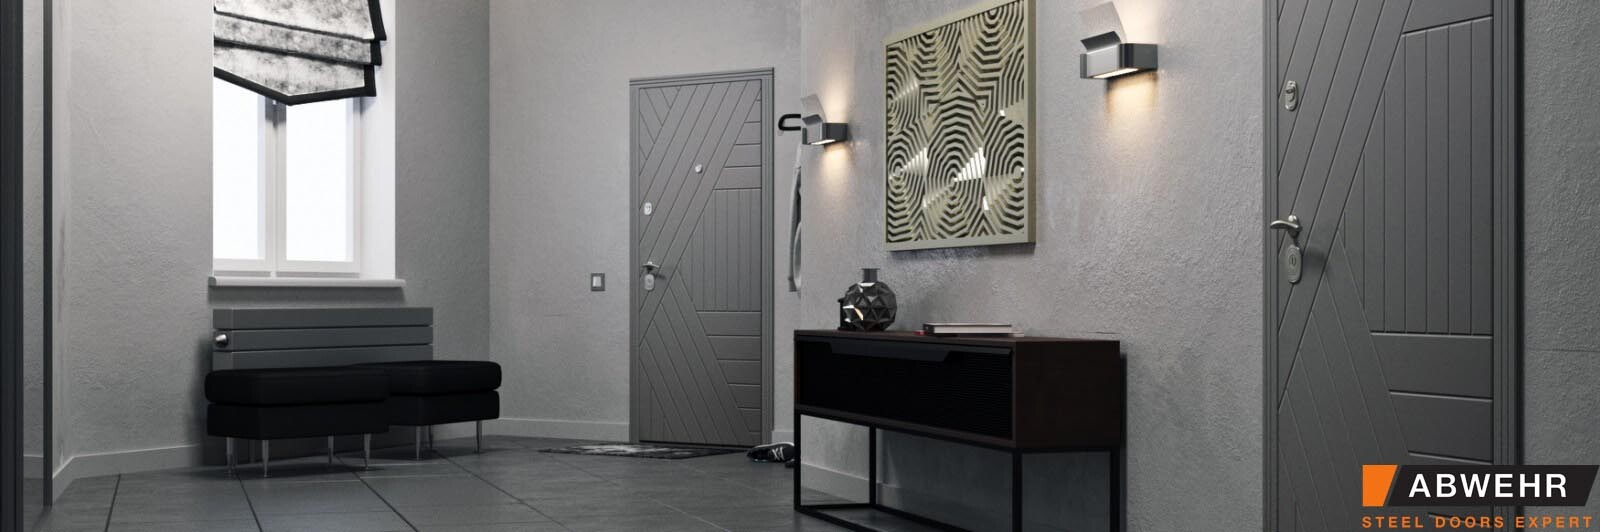 Doors Abwehr Mirta photo in the interior